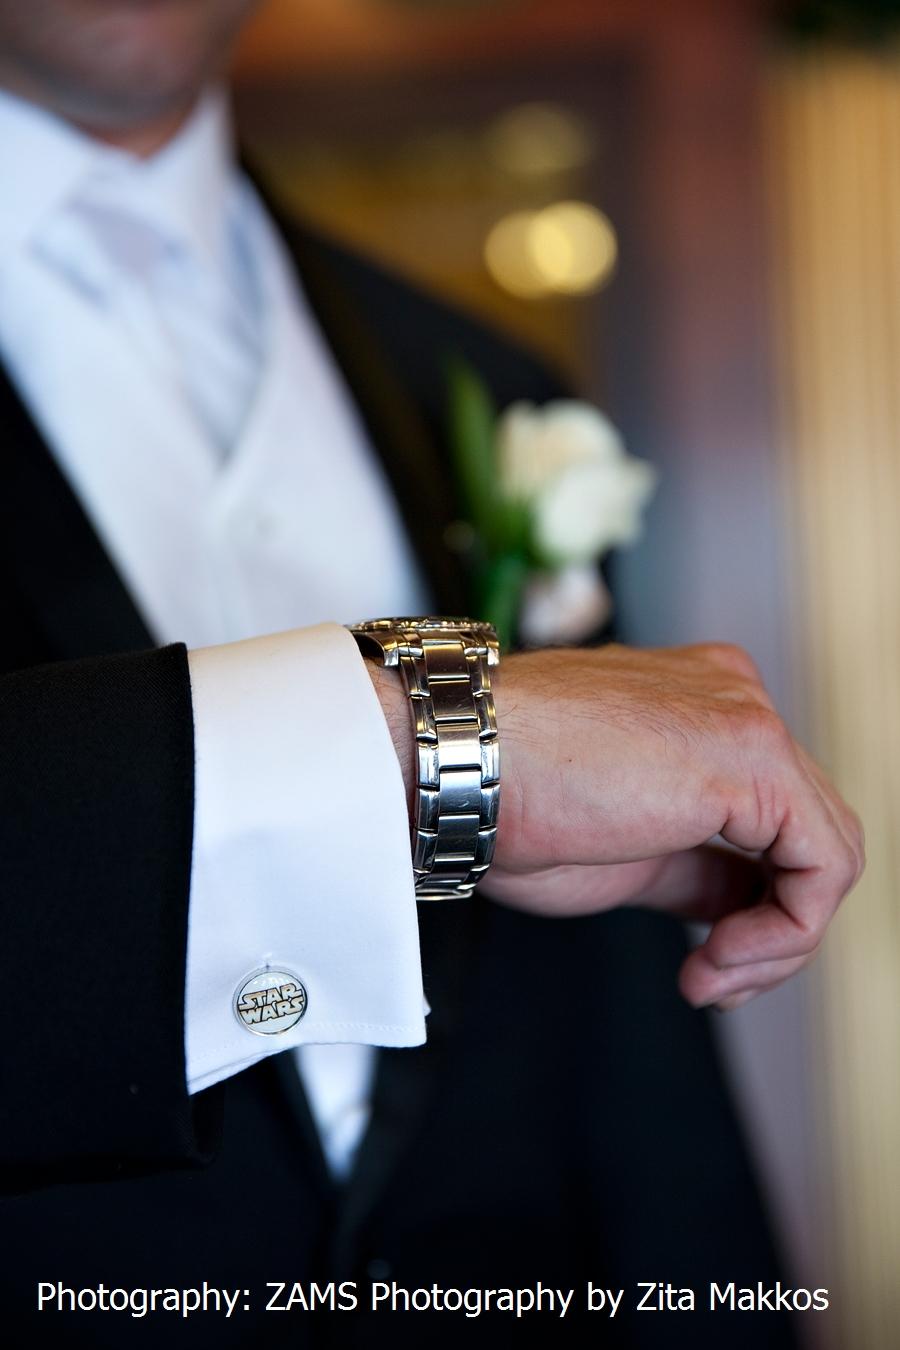 charlie_dont_surf_apocalypse_now_kilgore_quote_cuff_links_men_weddings_grooms_groomsmen_gifts_dads_graduations_cufflinks_3.jpg